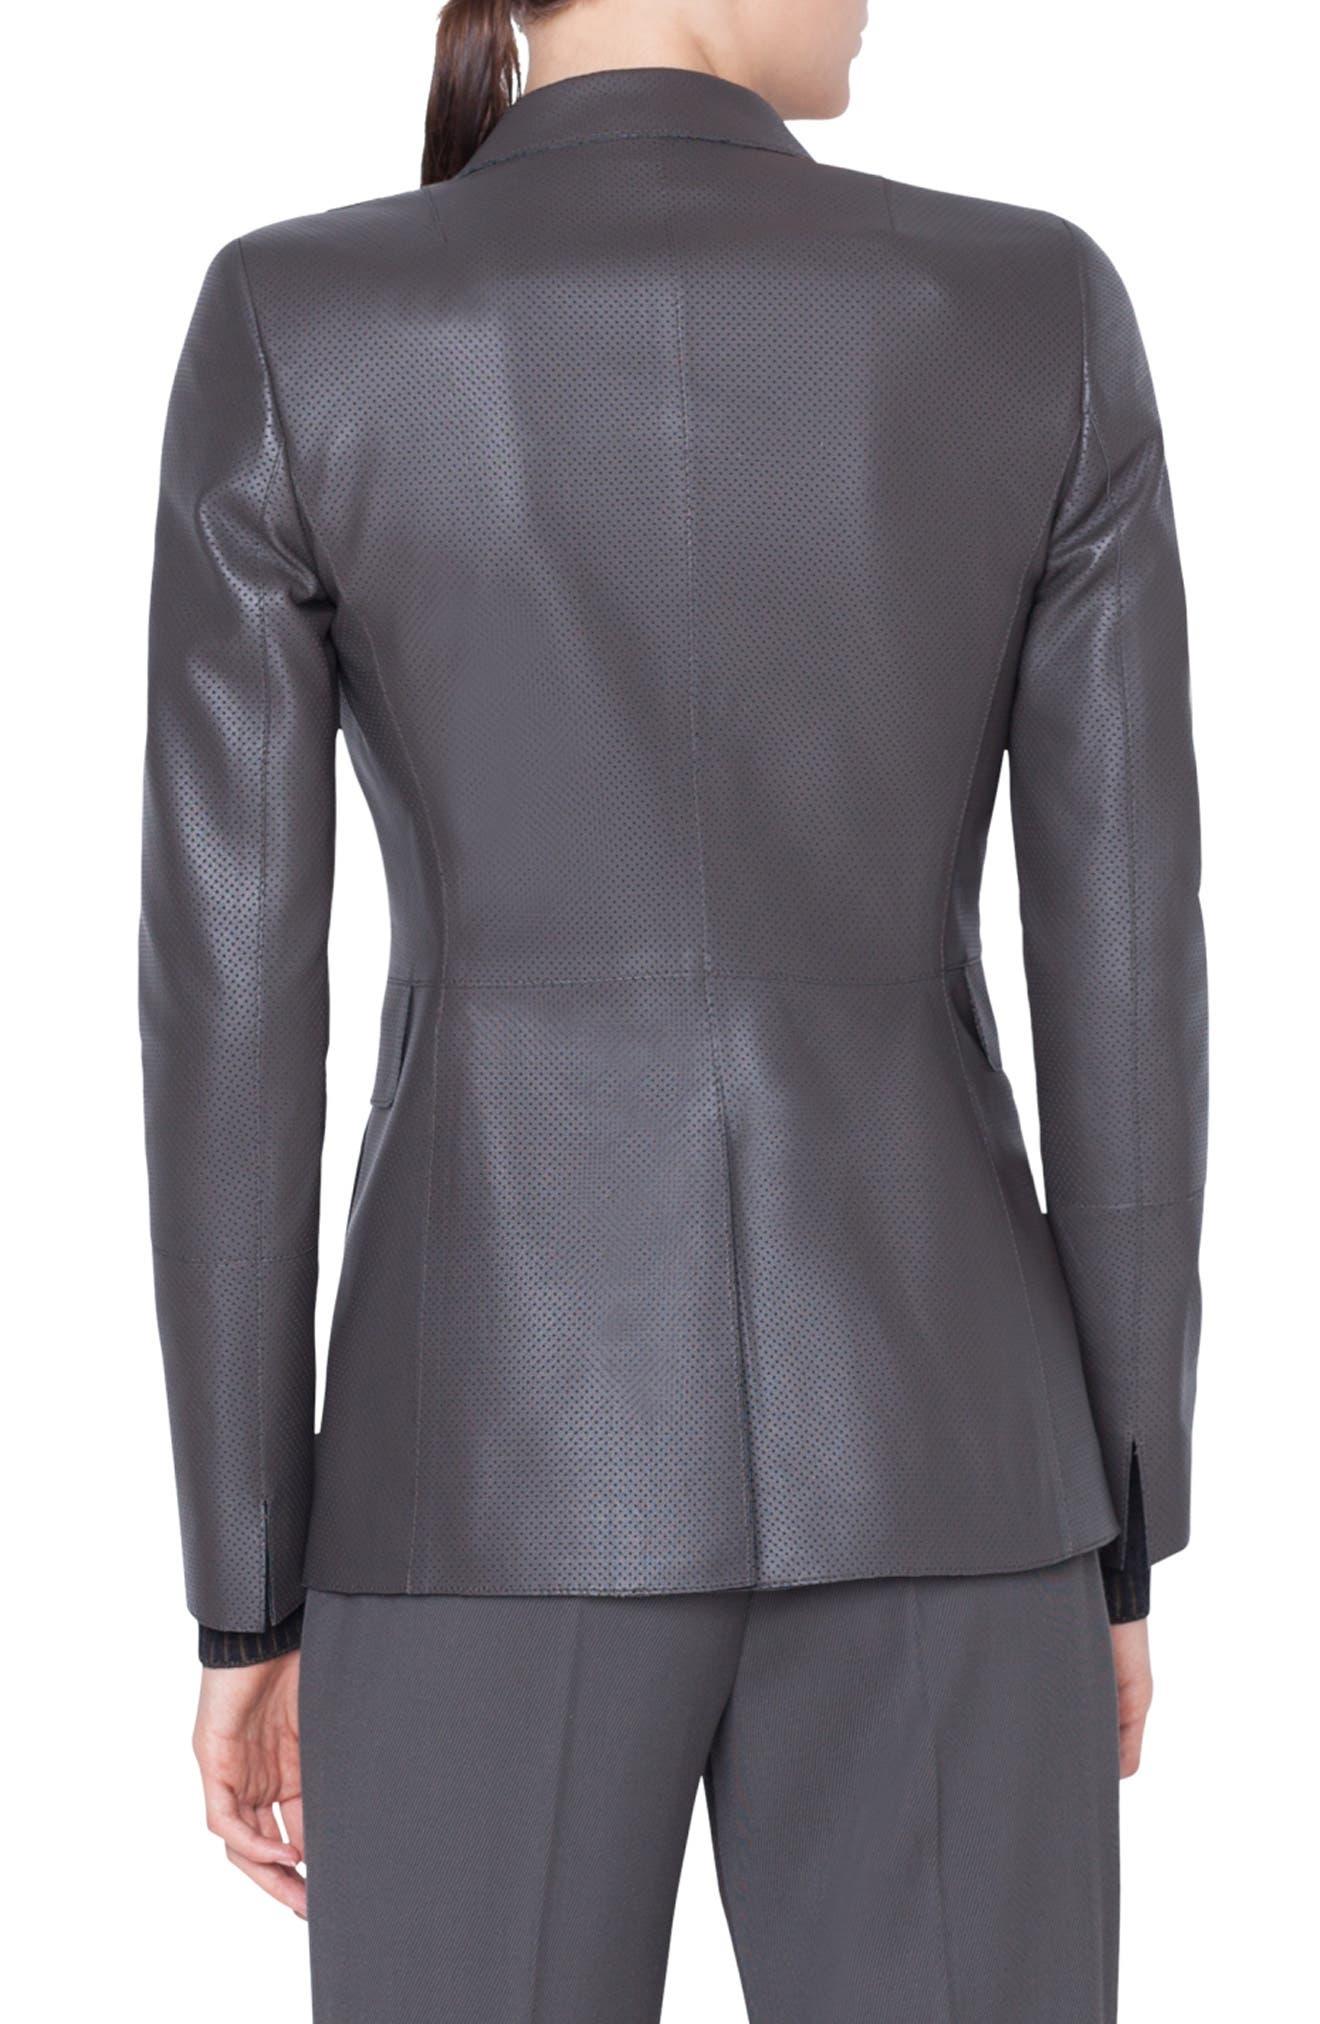 AKRIS PUNTO,                             Perforated Leather Blazer,                             Alternate thumbnail 2, color,                             OLIVA